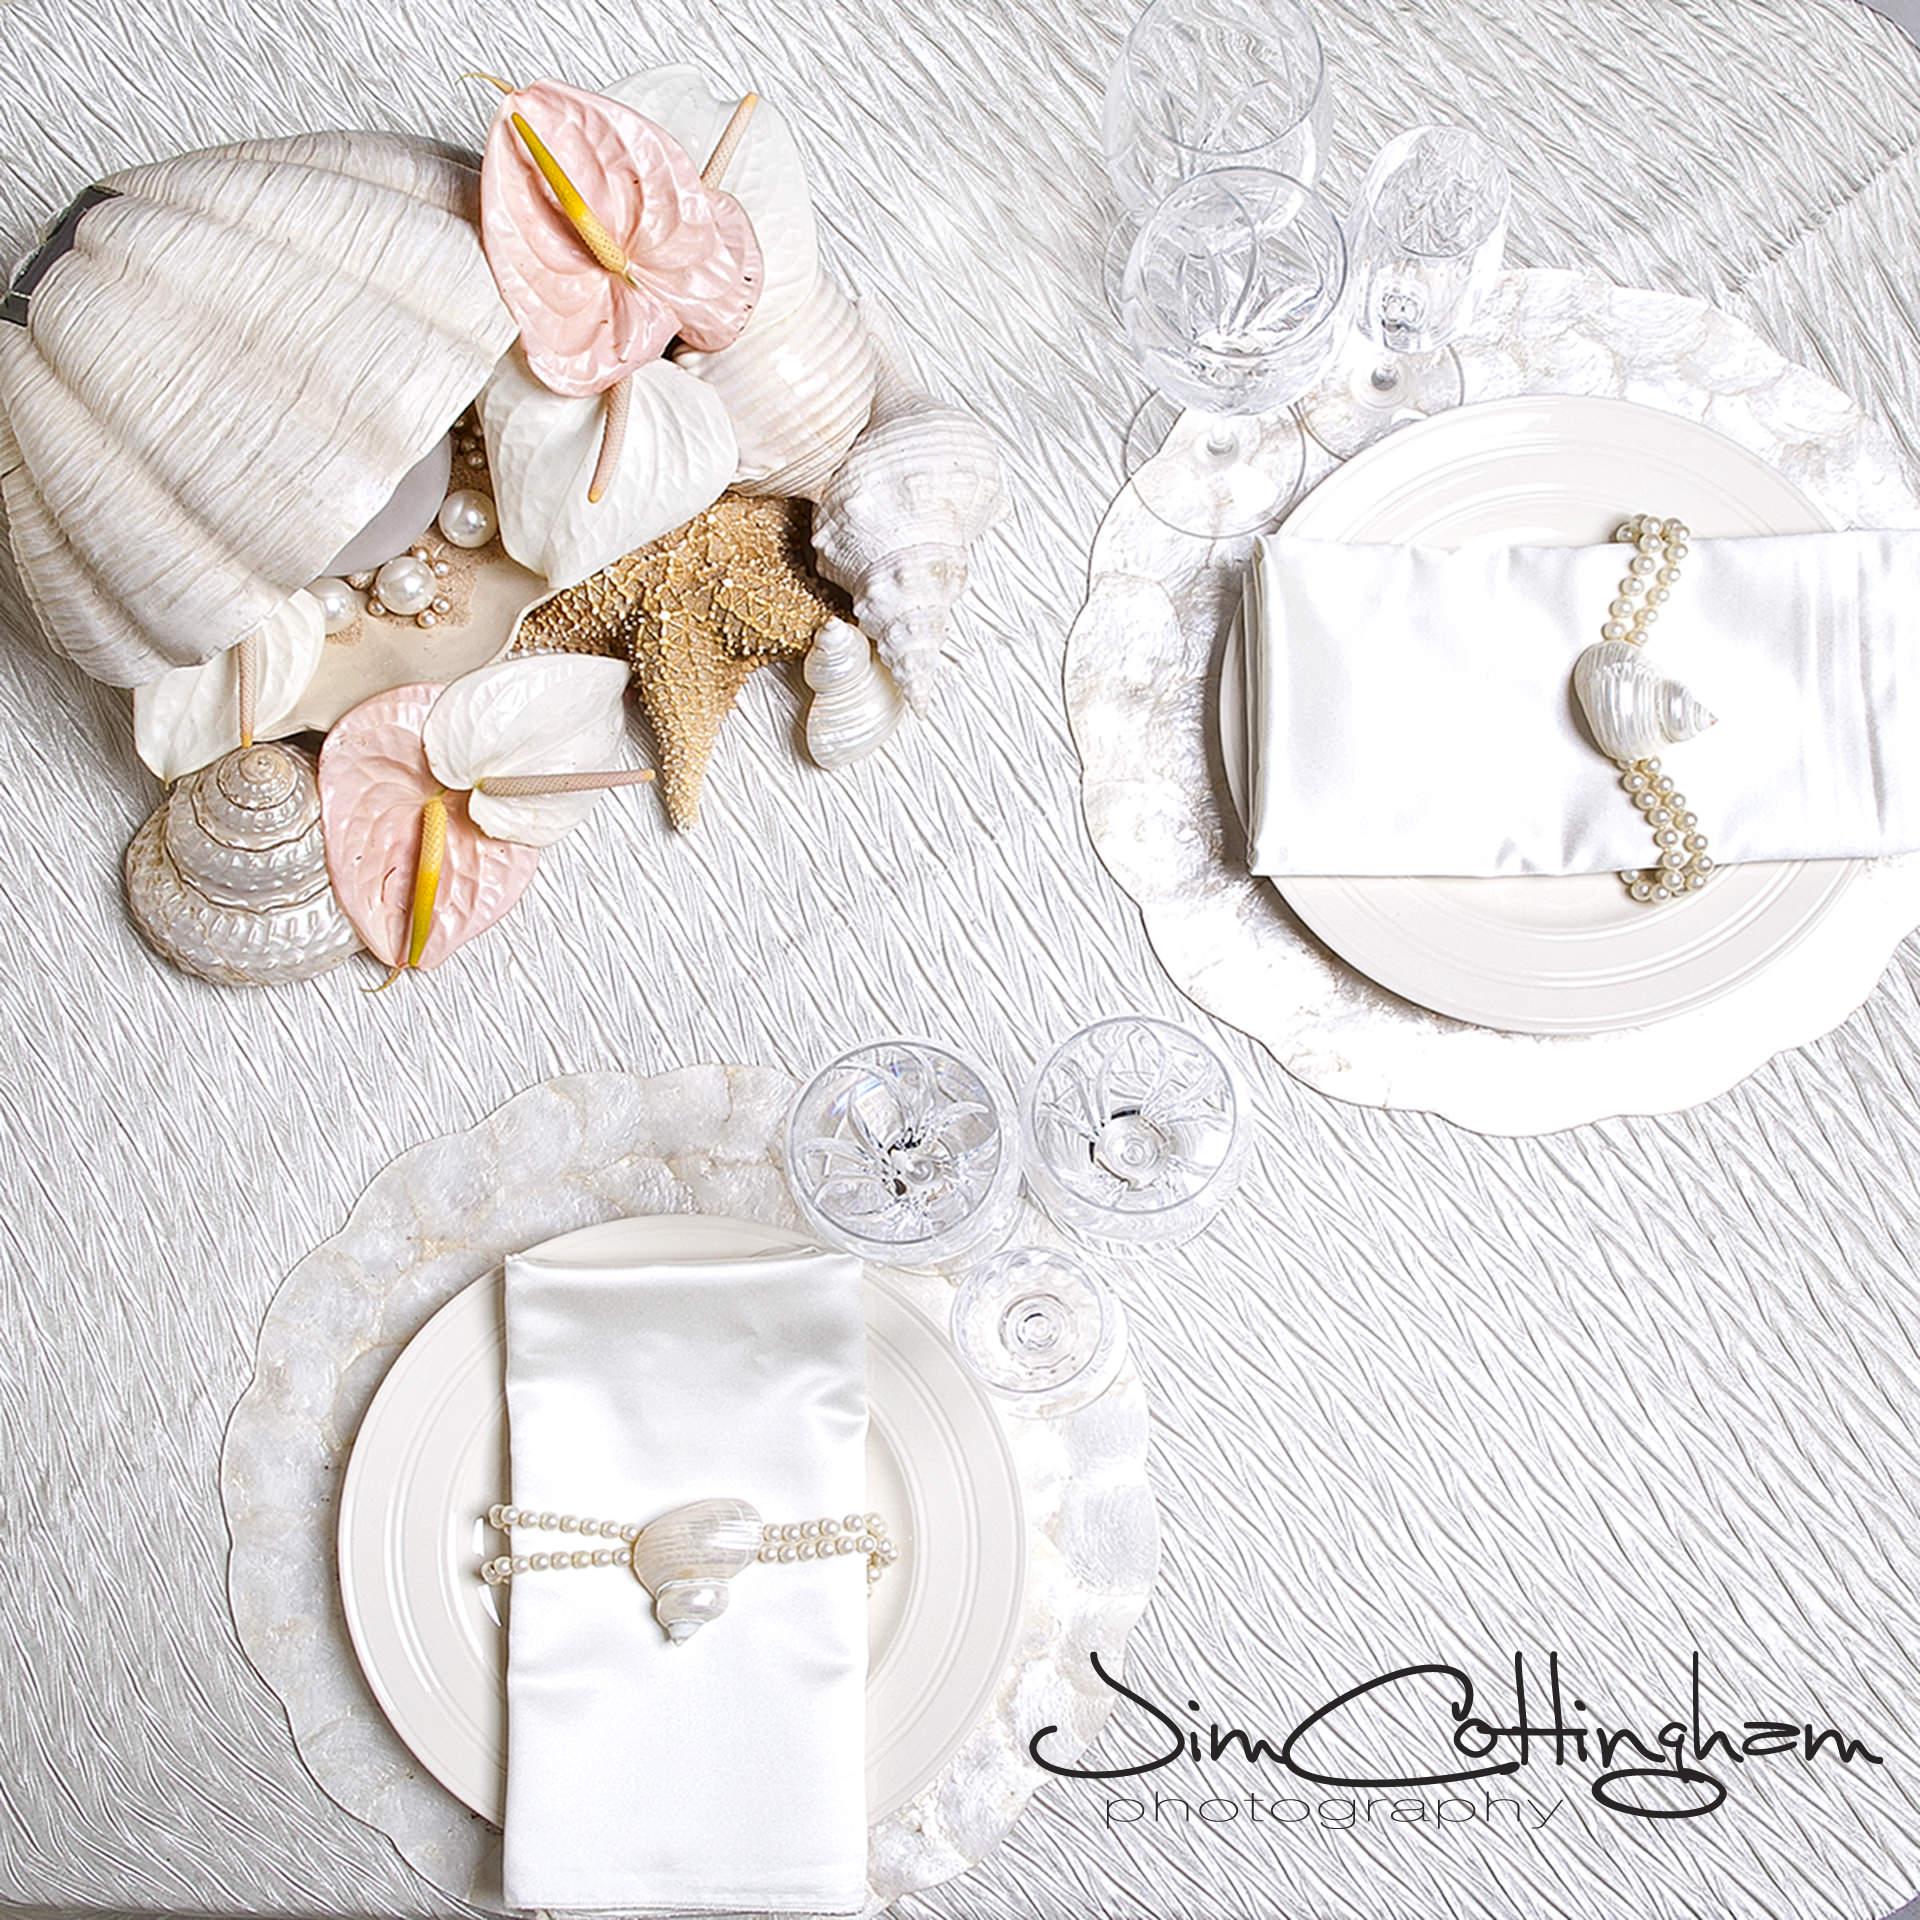 02 Philadelphia Wedding Florist Cream and Blush Seashell Centerpiece Anthurium Pearls.jpg